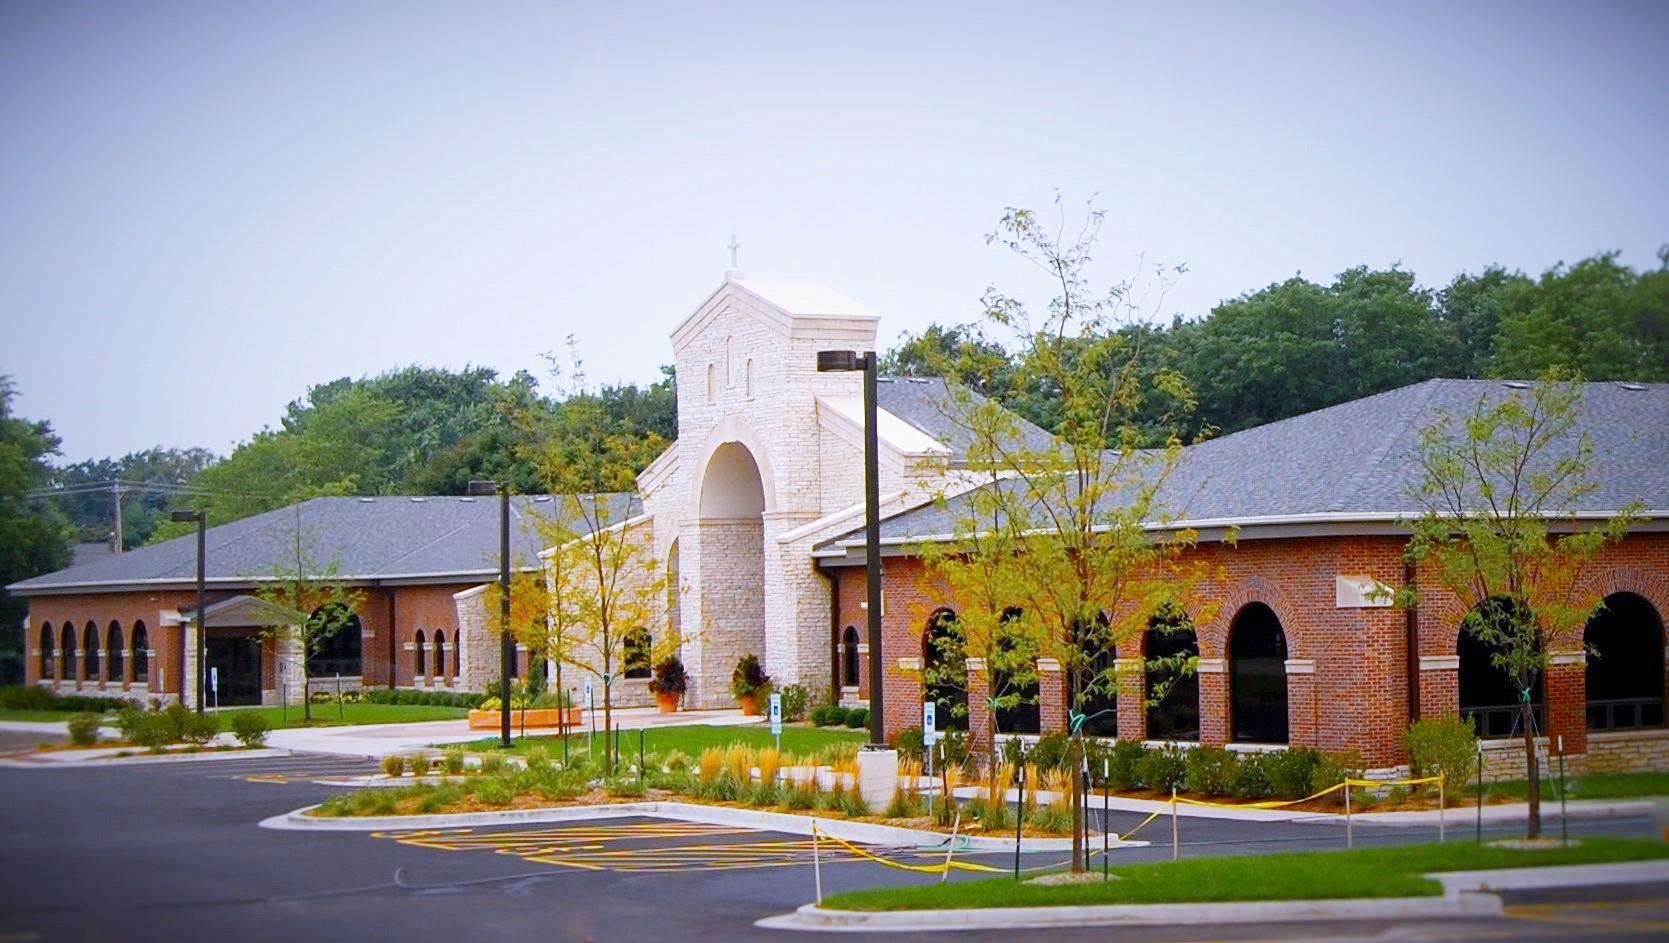 Pre-School entrance next to the church